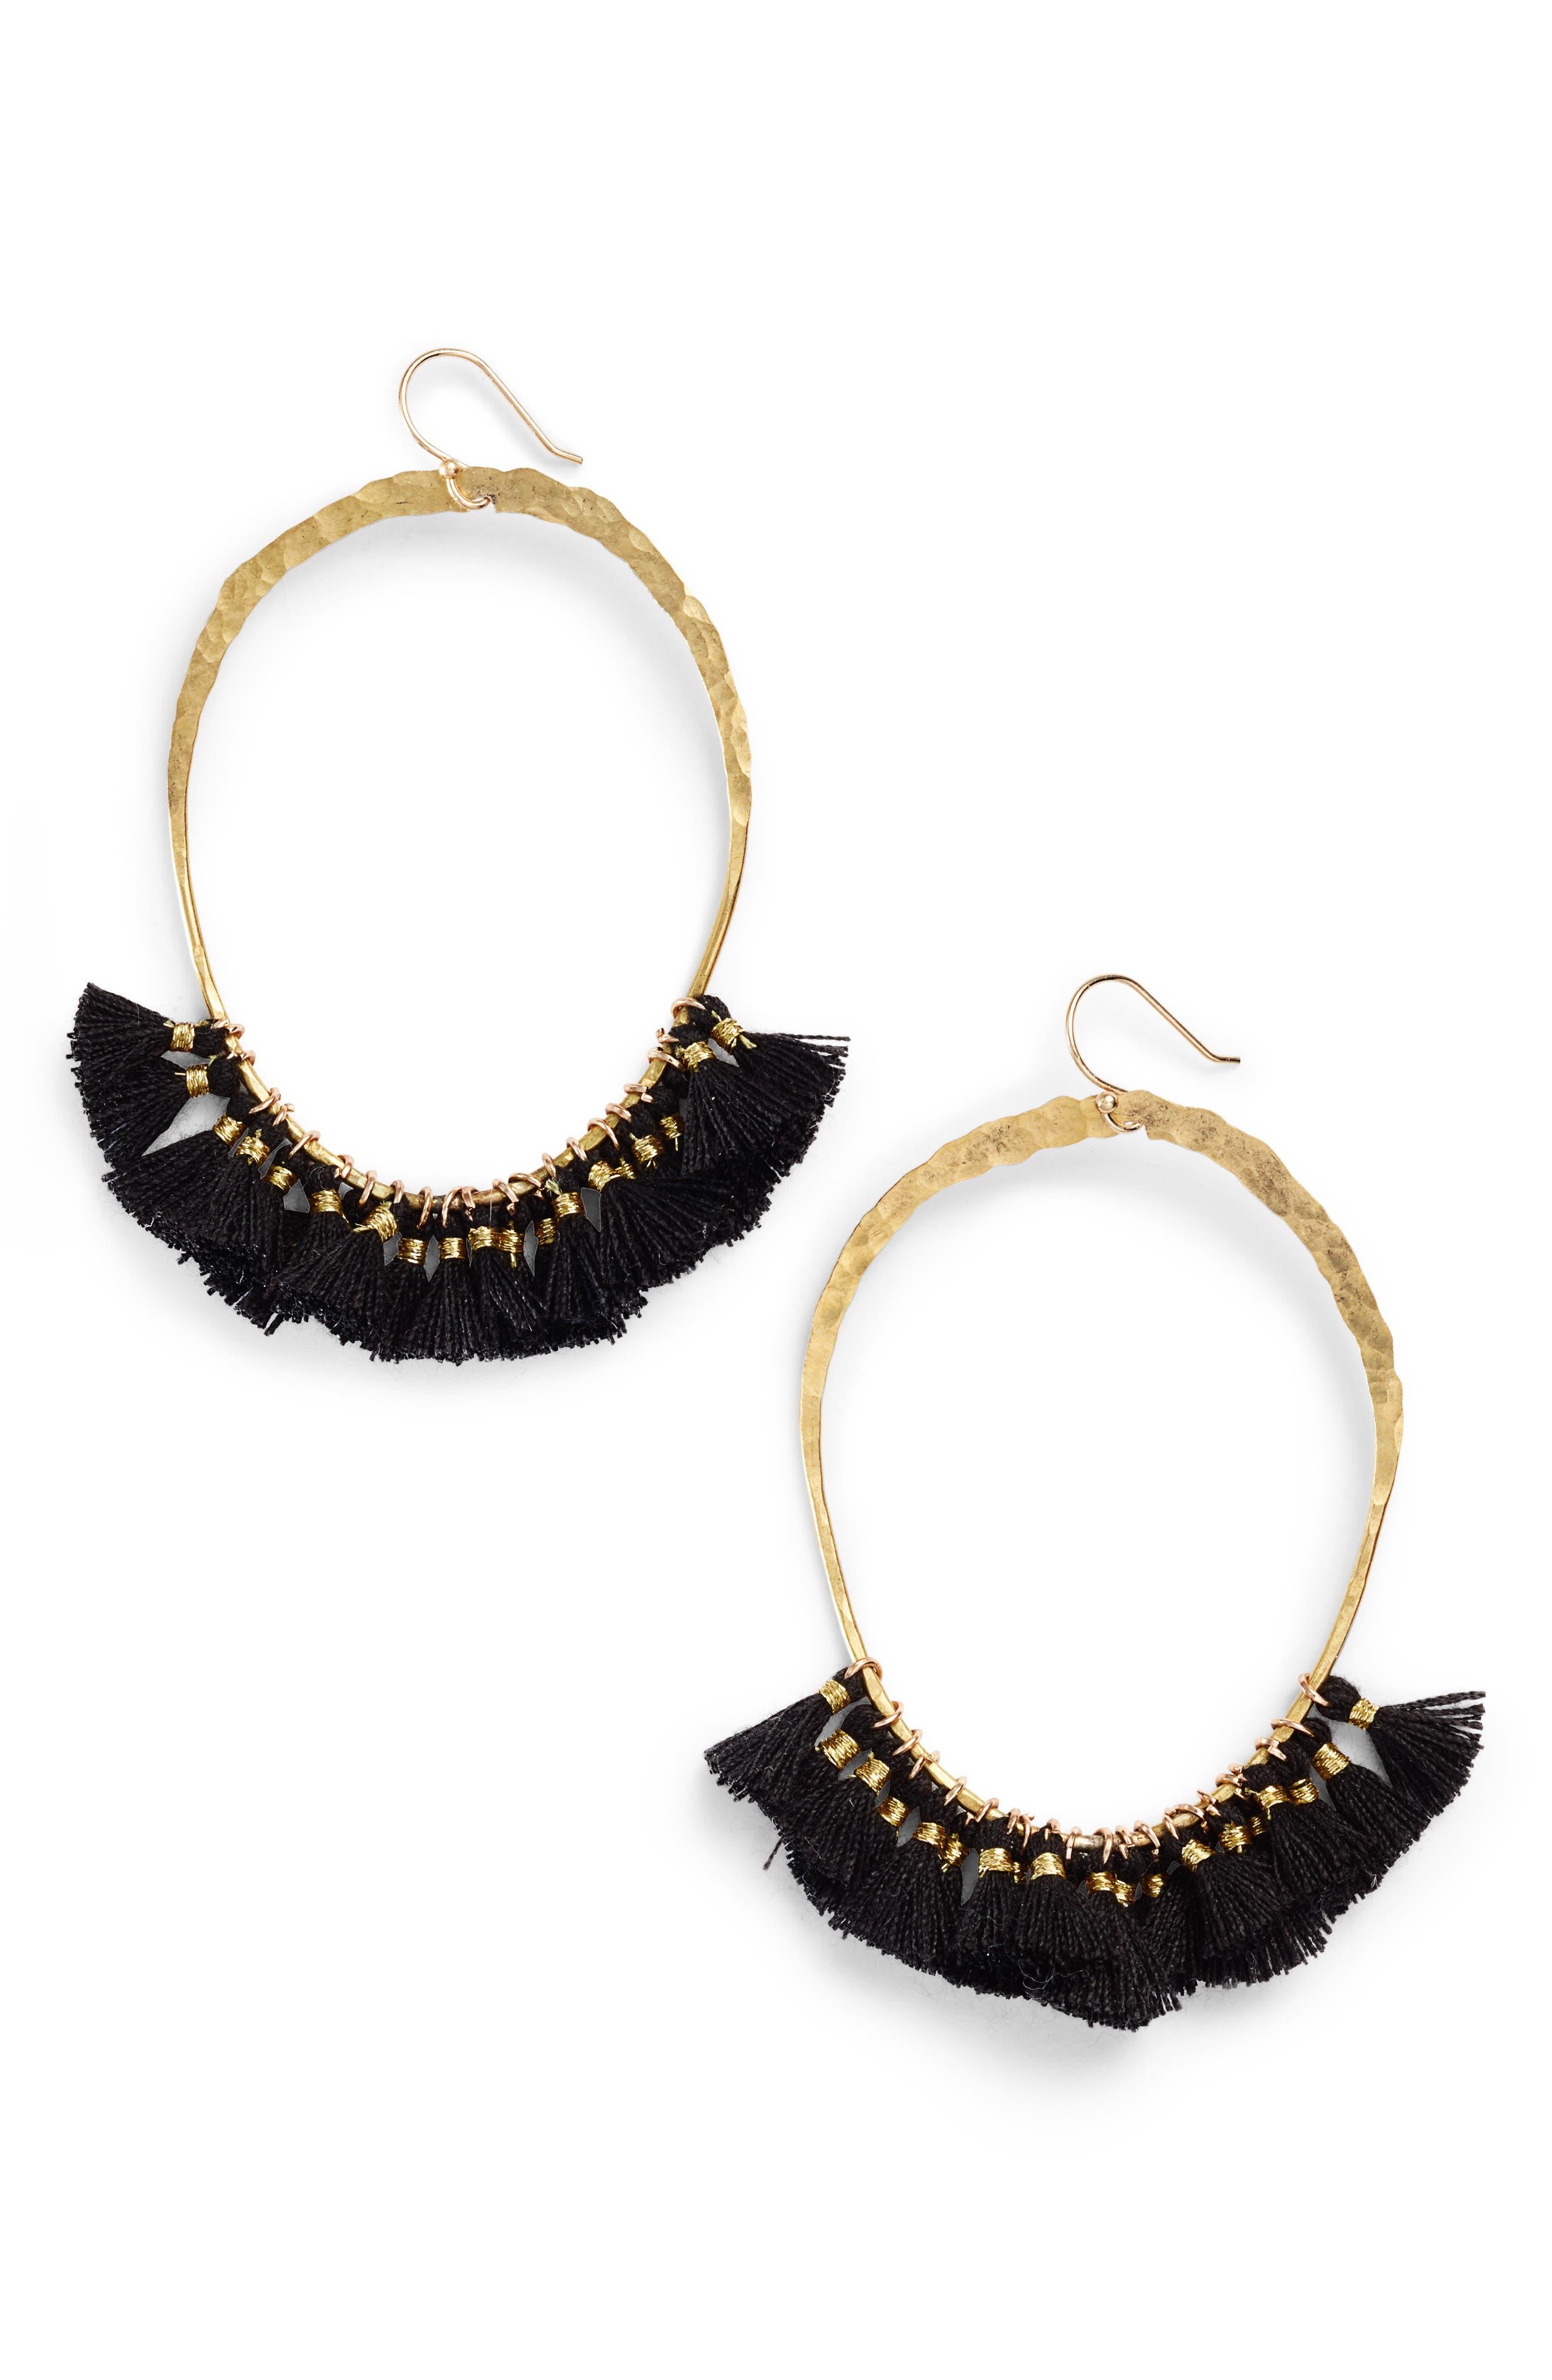 Tassel Hoop Earrings,                             Main thumbnail 1, color,                             GOLD/ BLACK